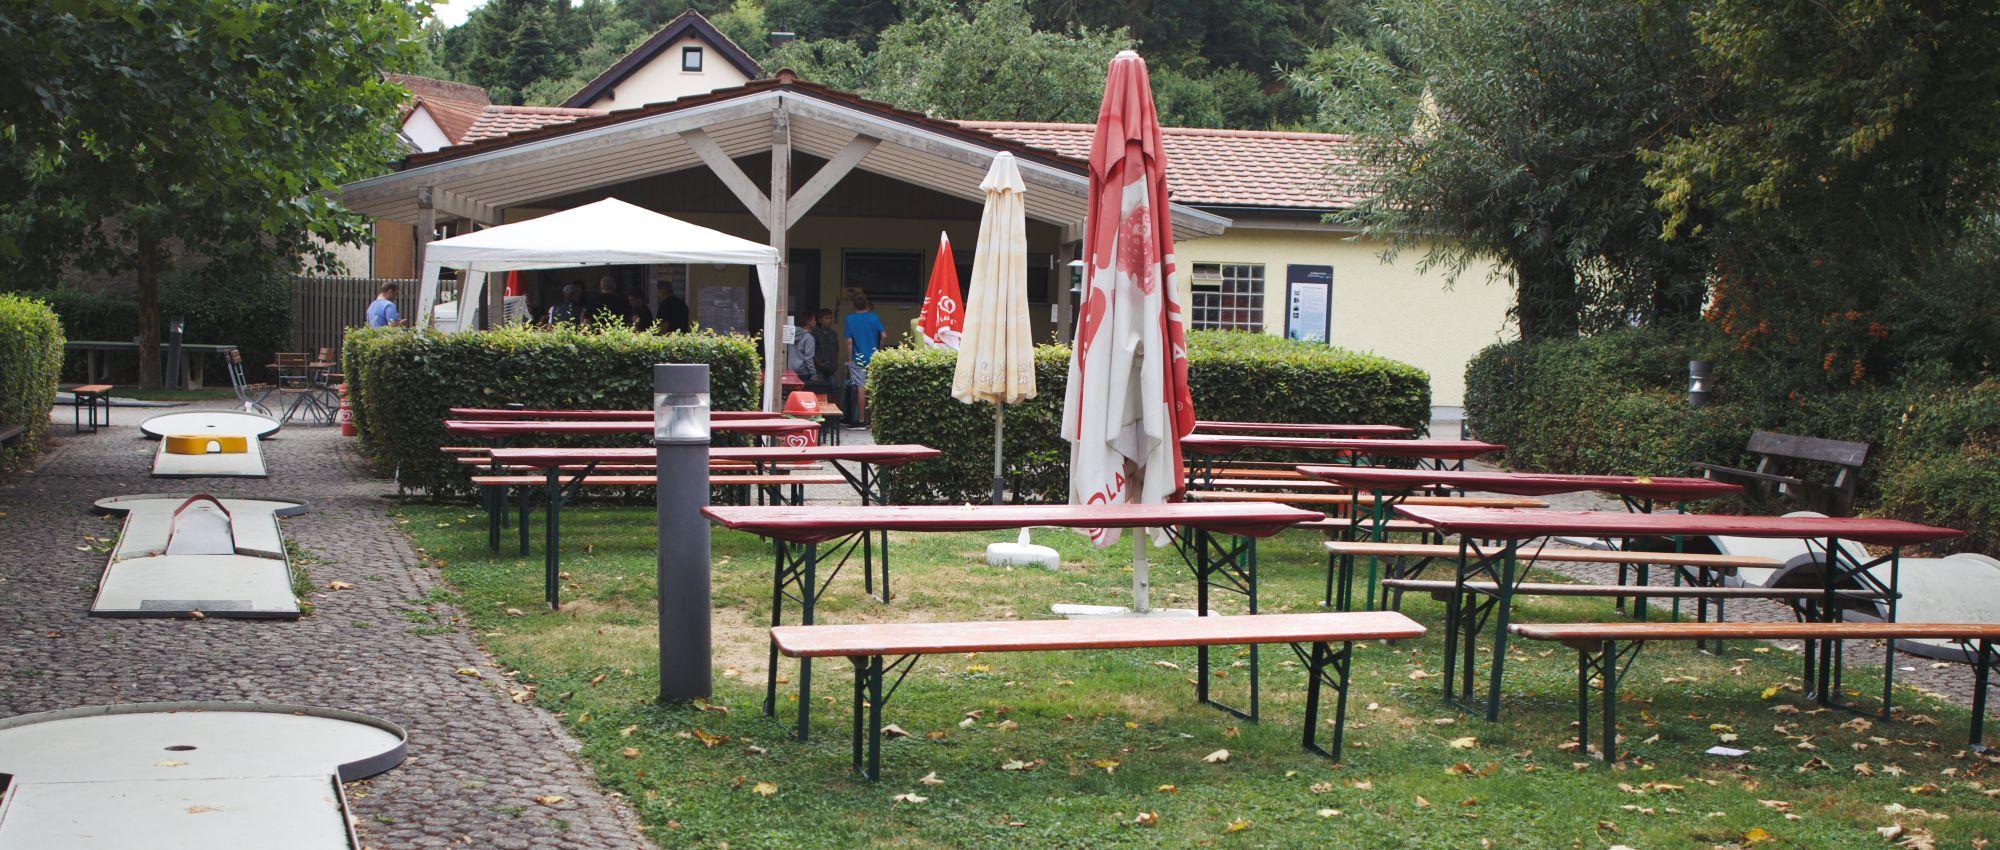 Dürrbachpark Minigolfanlage Güntersleben